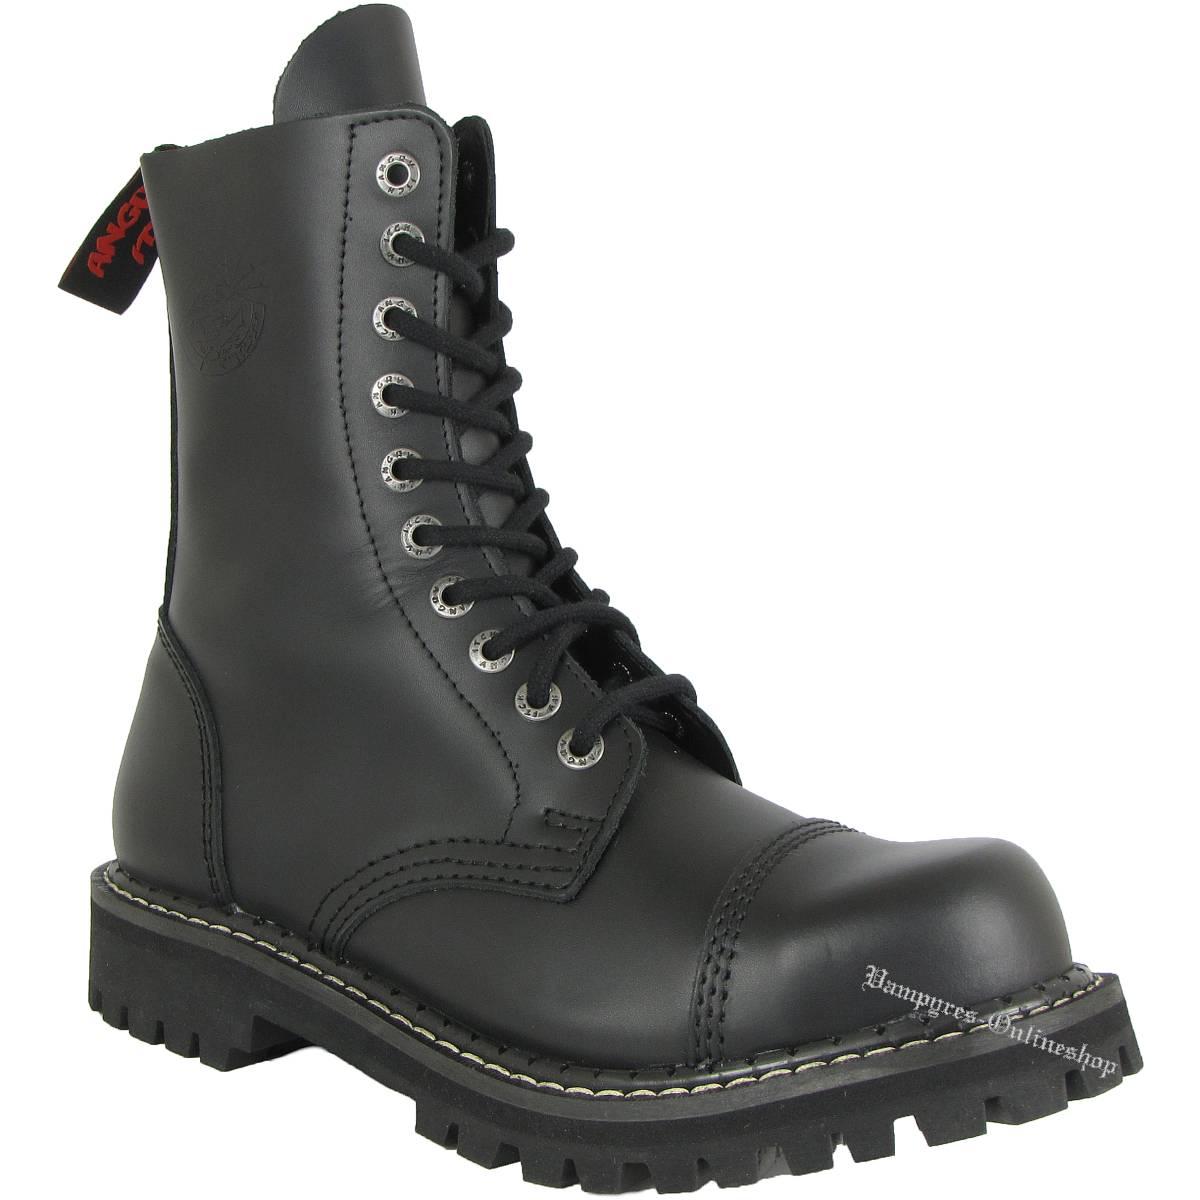 Angry Itch 10-Loch Schwarz Rangers Stiefel Schuhe